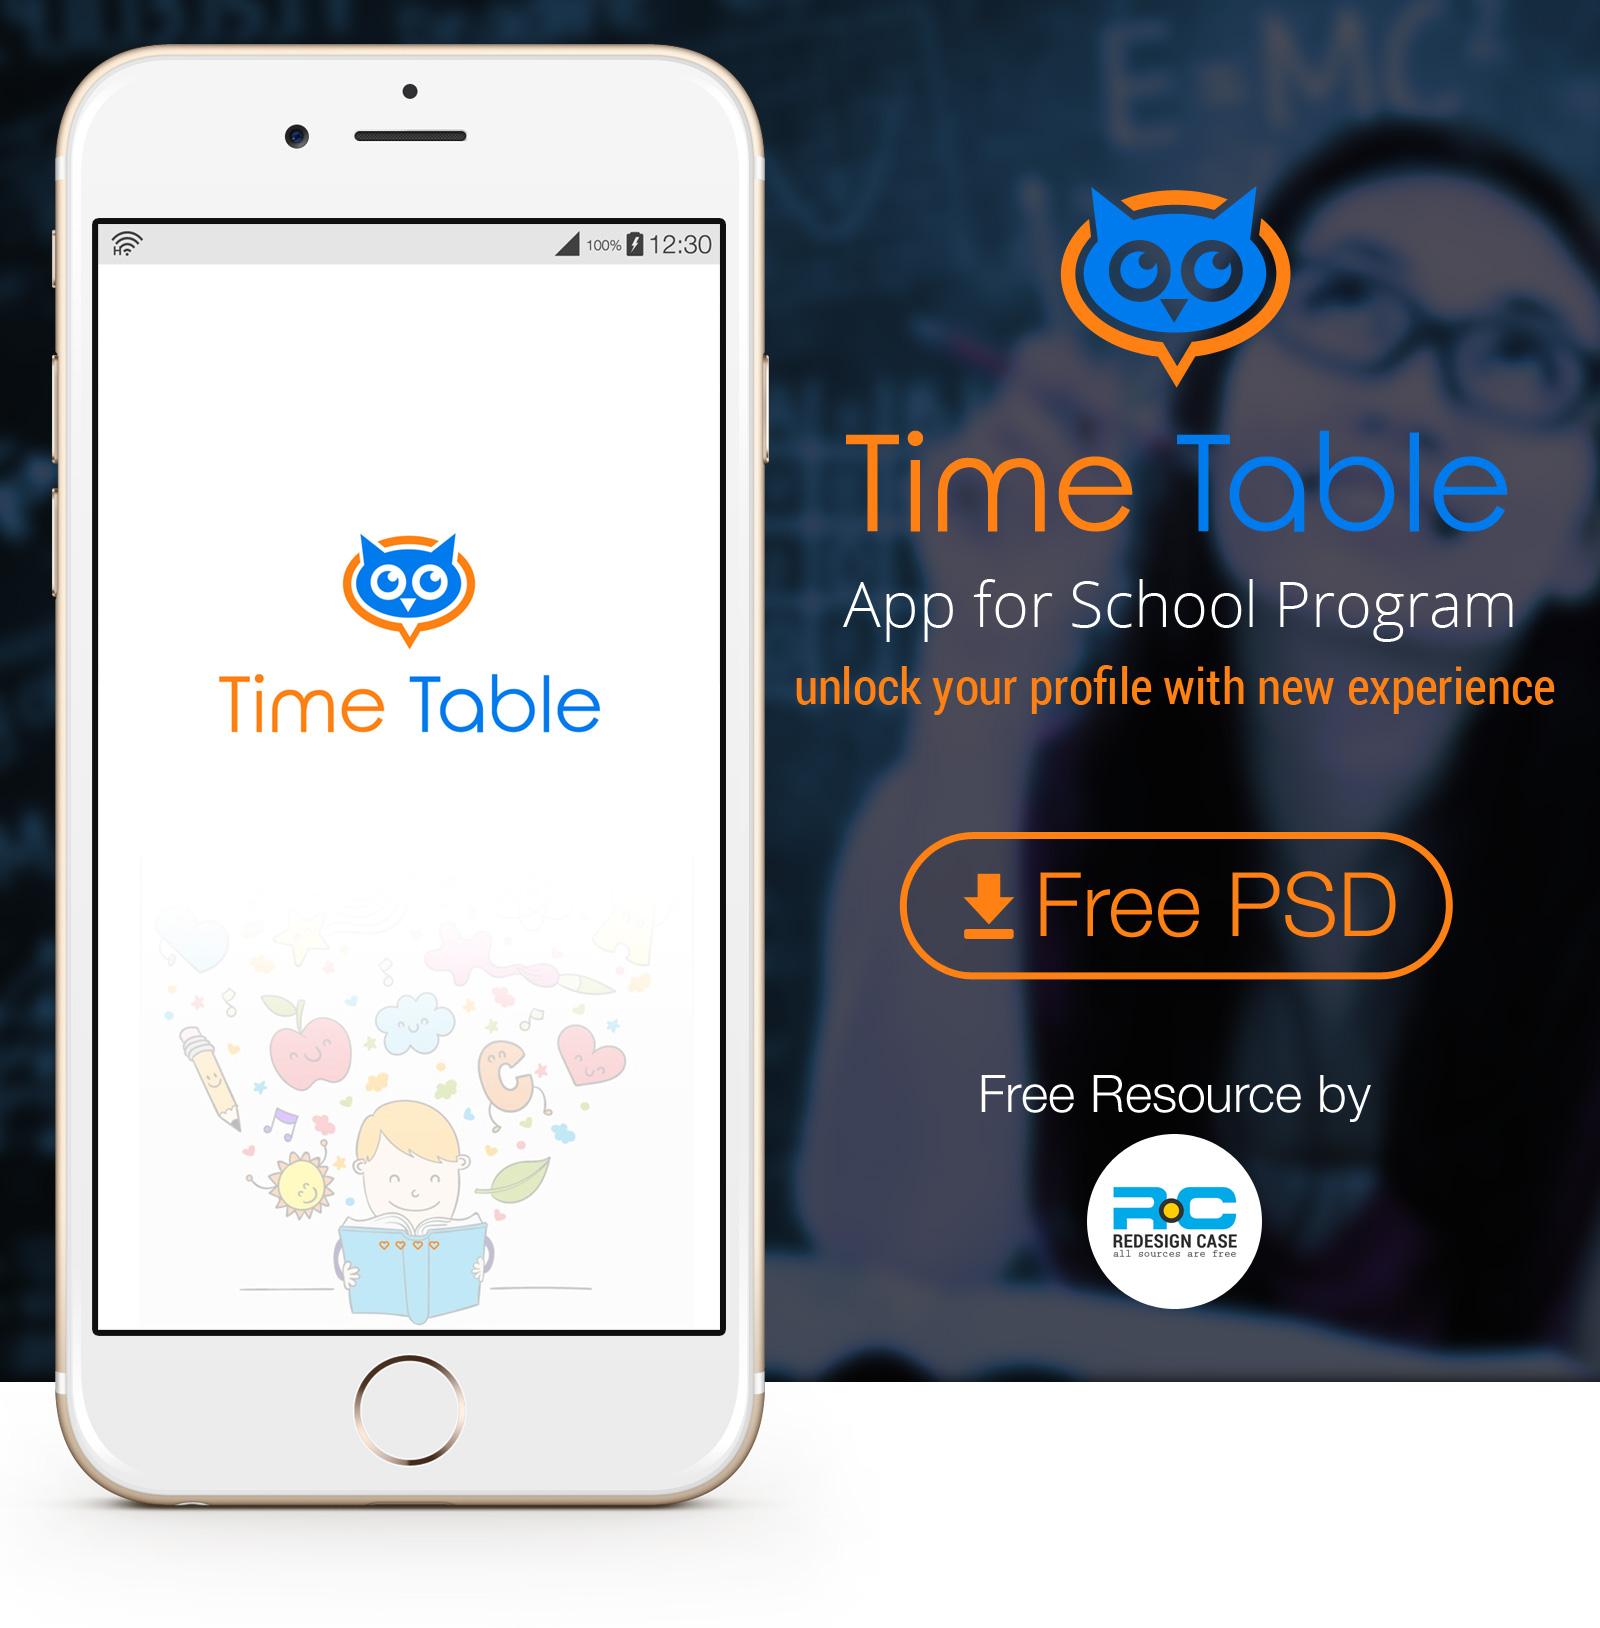 Collection of color palettes photoshop for ui designs web3canvas - School Time Table Mobile App Ui Kit